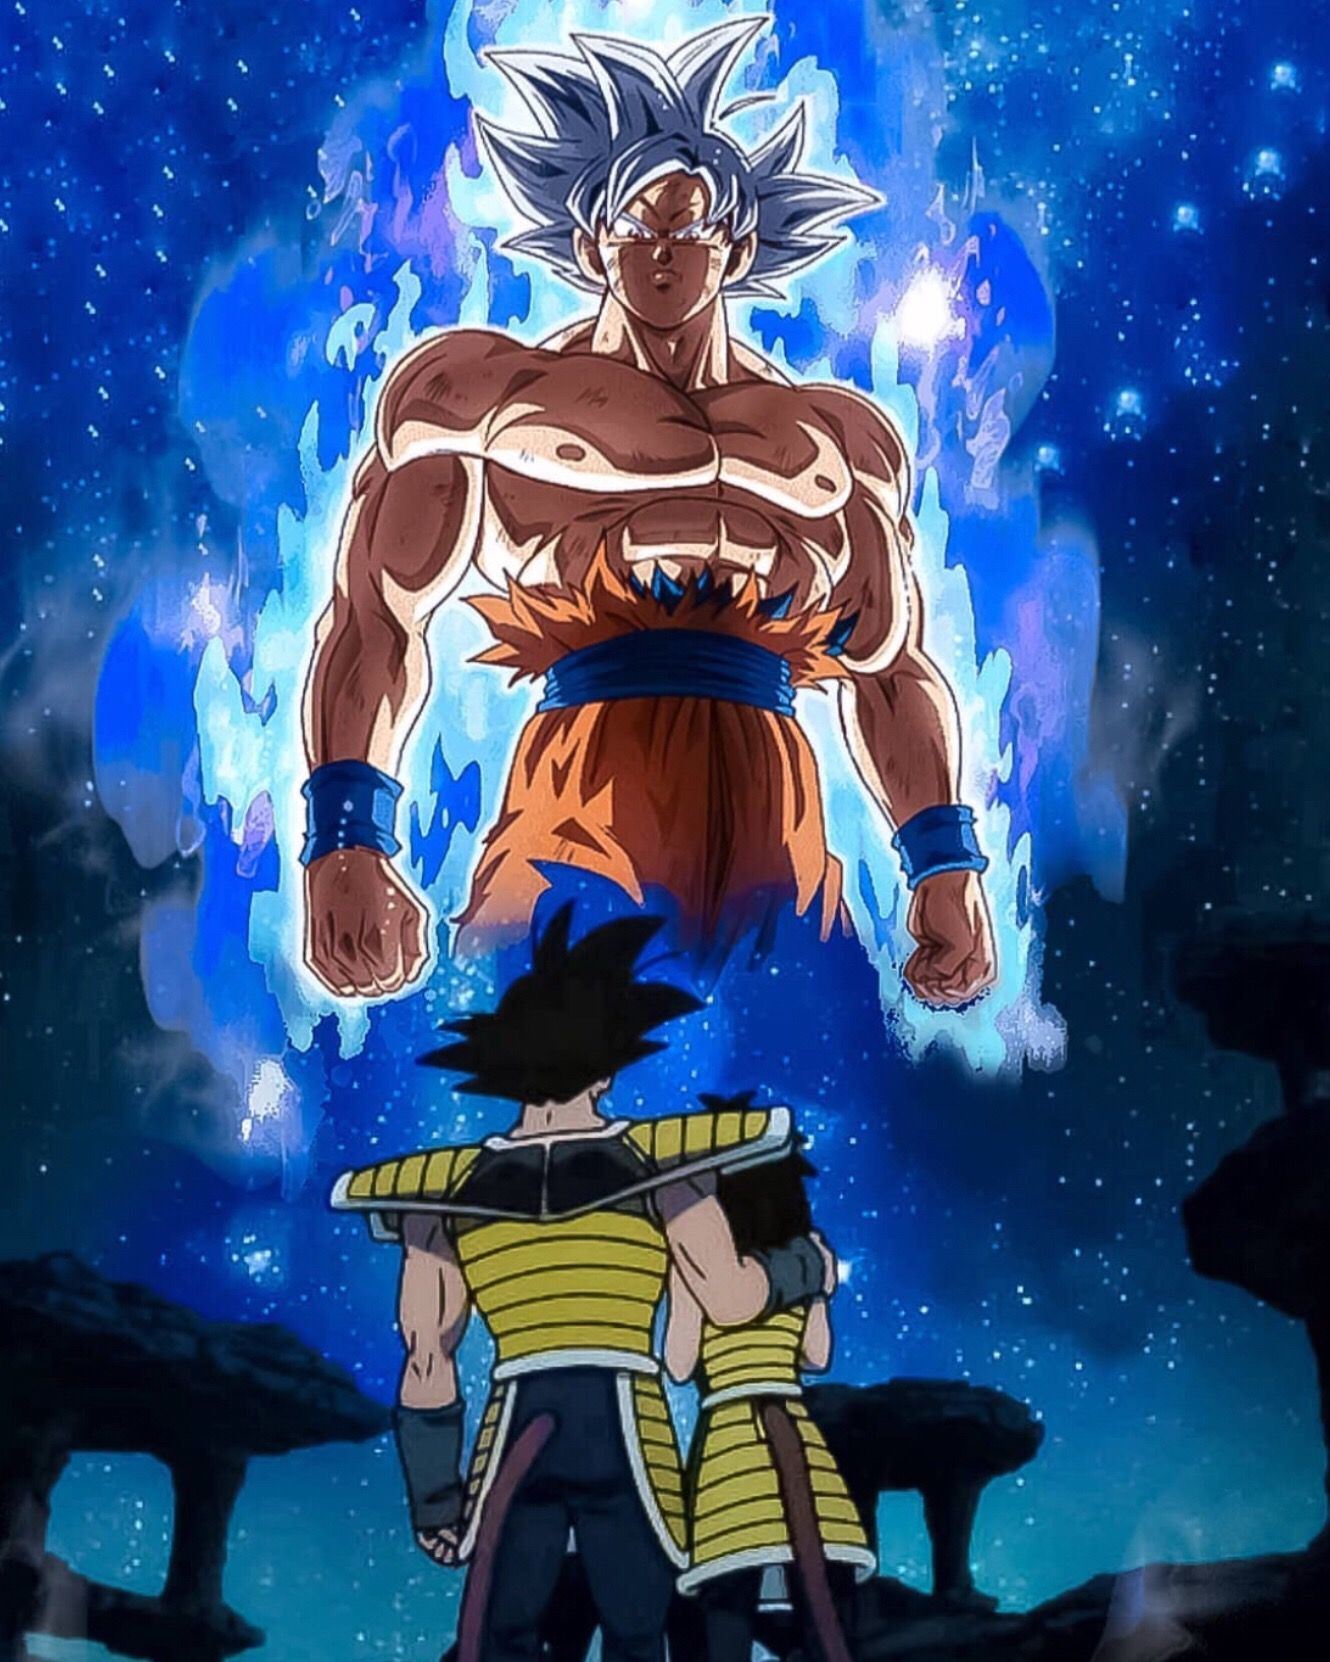 Freetoedit Bardock Gine Goku Gokuultrainstinct Dragonballsuperbroly Comenten Si Les Gusto Dragon Ball Super Manga Dragon Ball Art Dragon Ball Super Goku